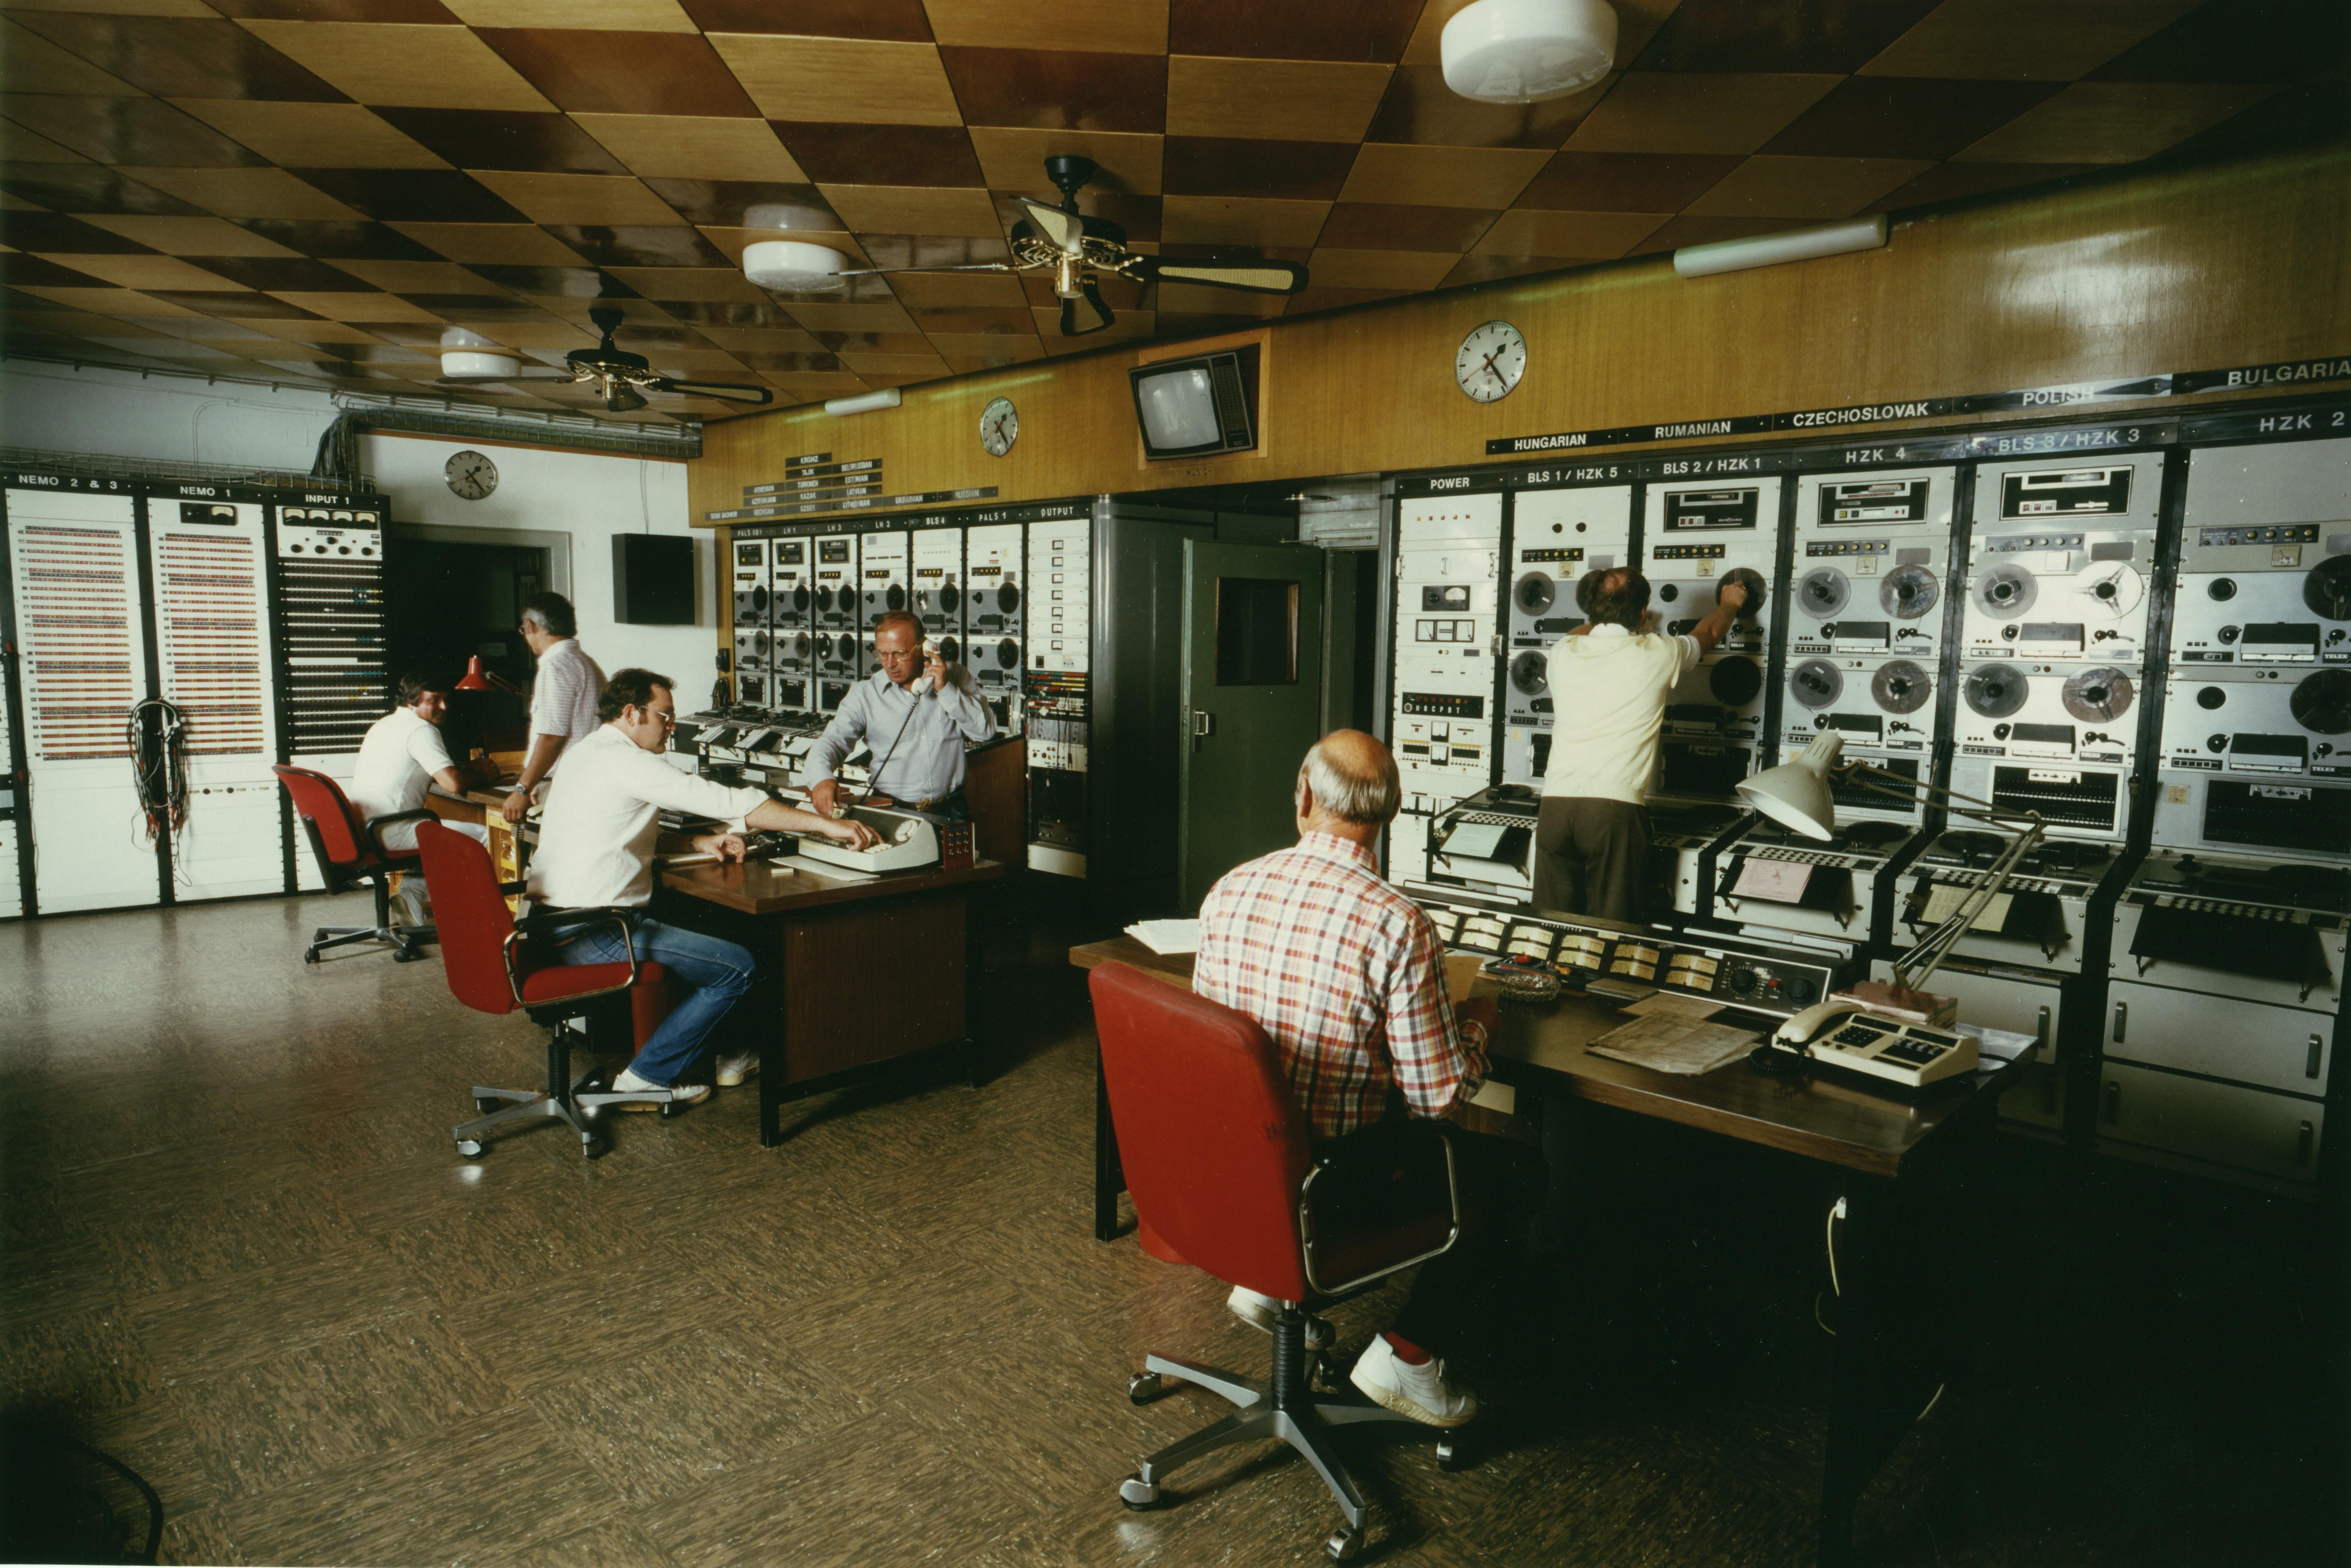 RFE/RL studio